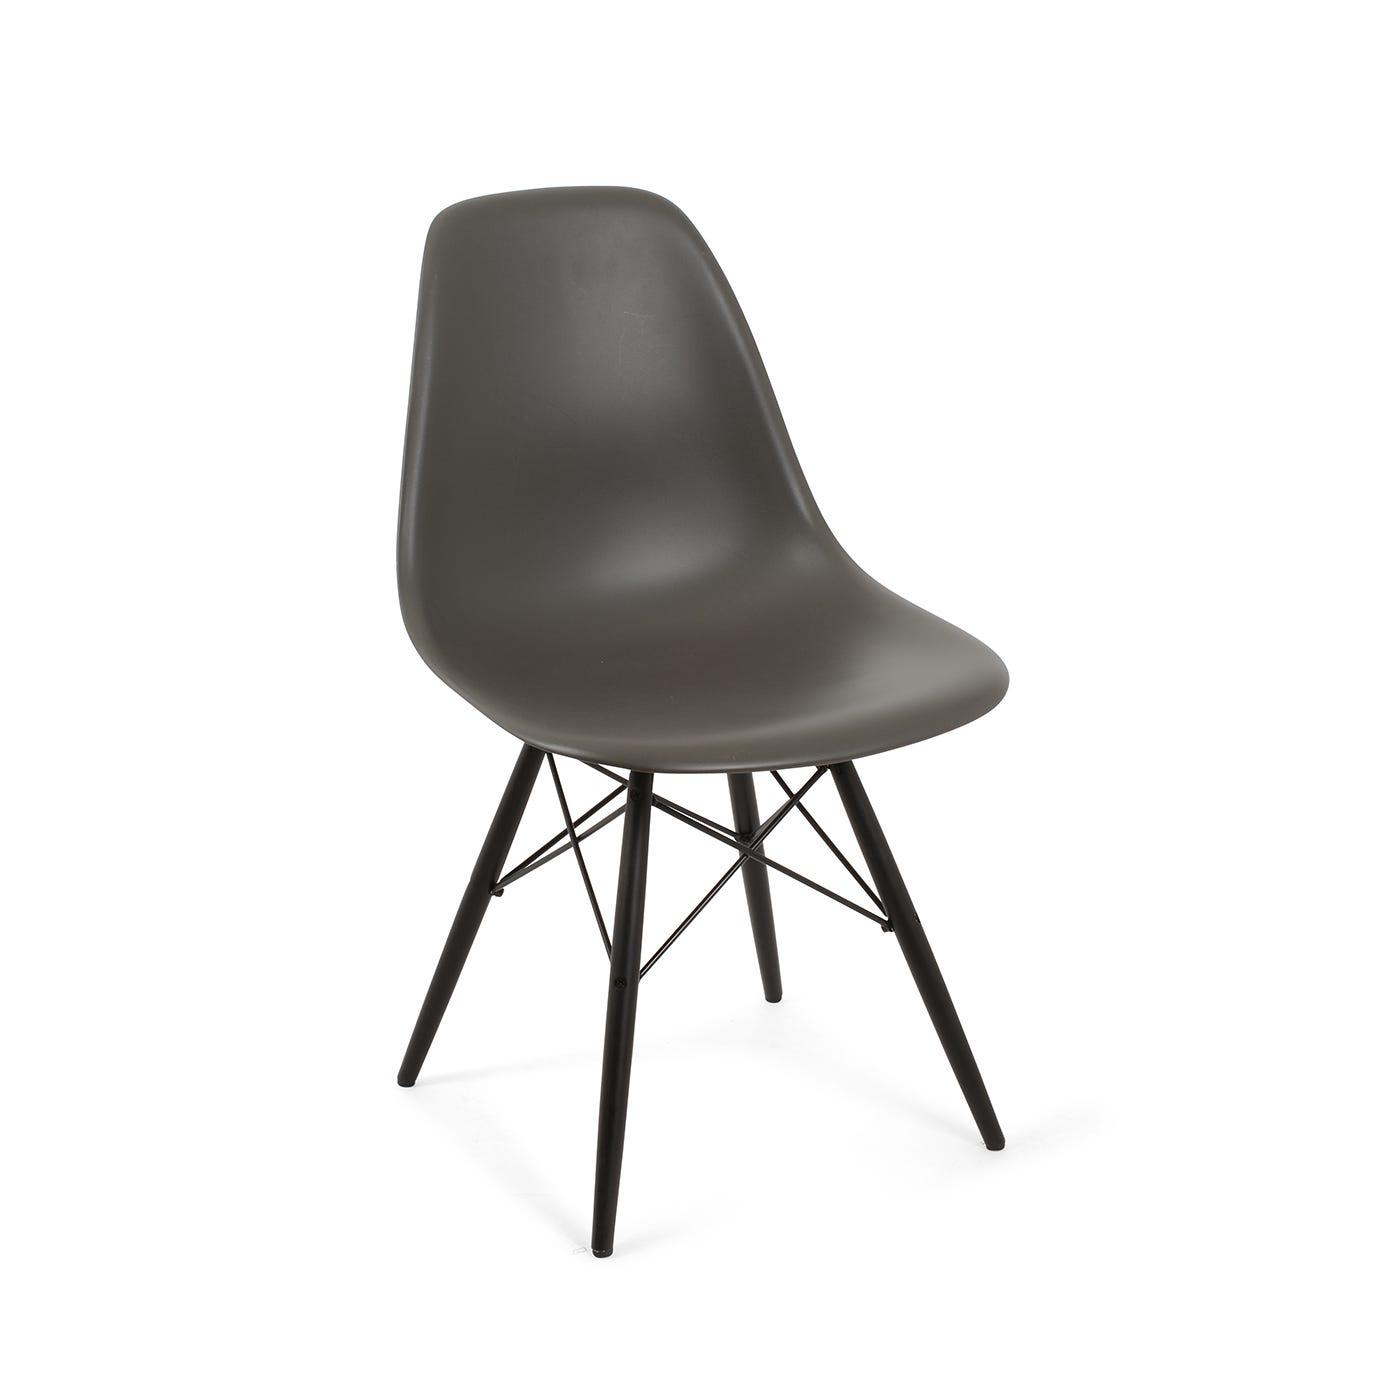 Eames DSW Chair New Height Basalt Dark Maple Legs